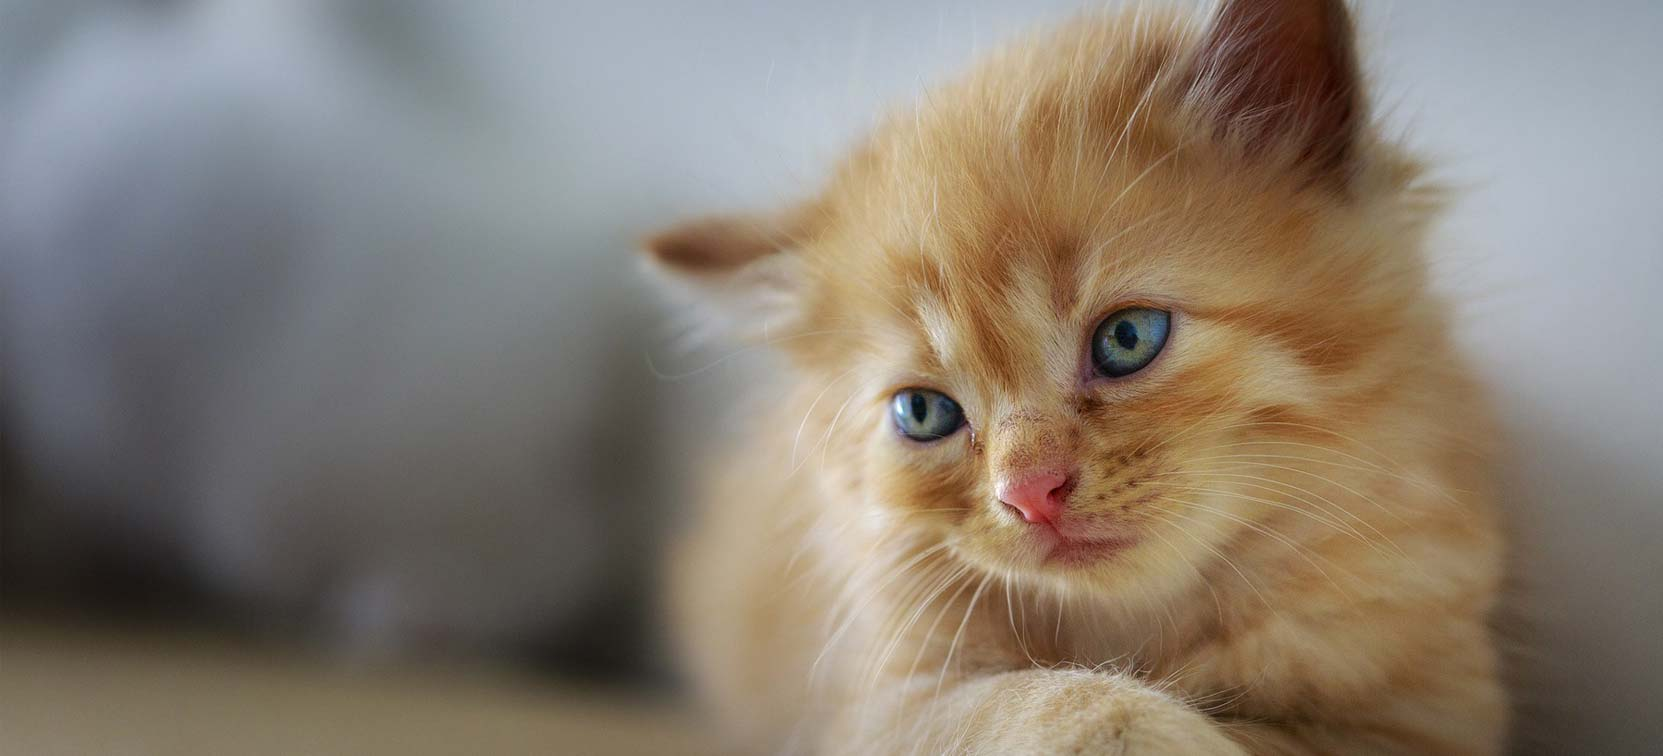 Katten Dier Medisch Centrum Goor